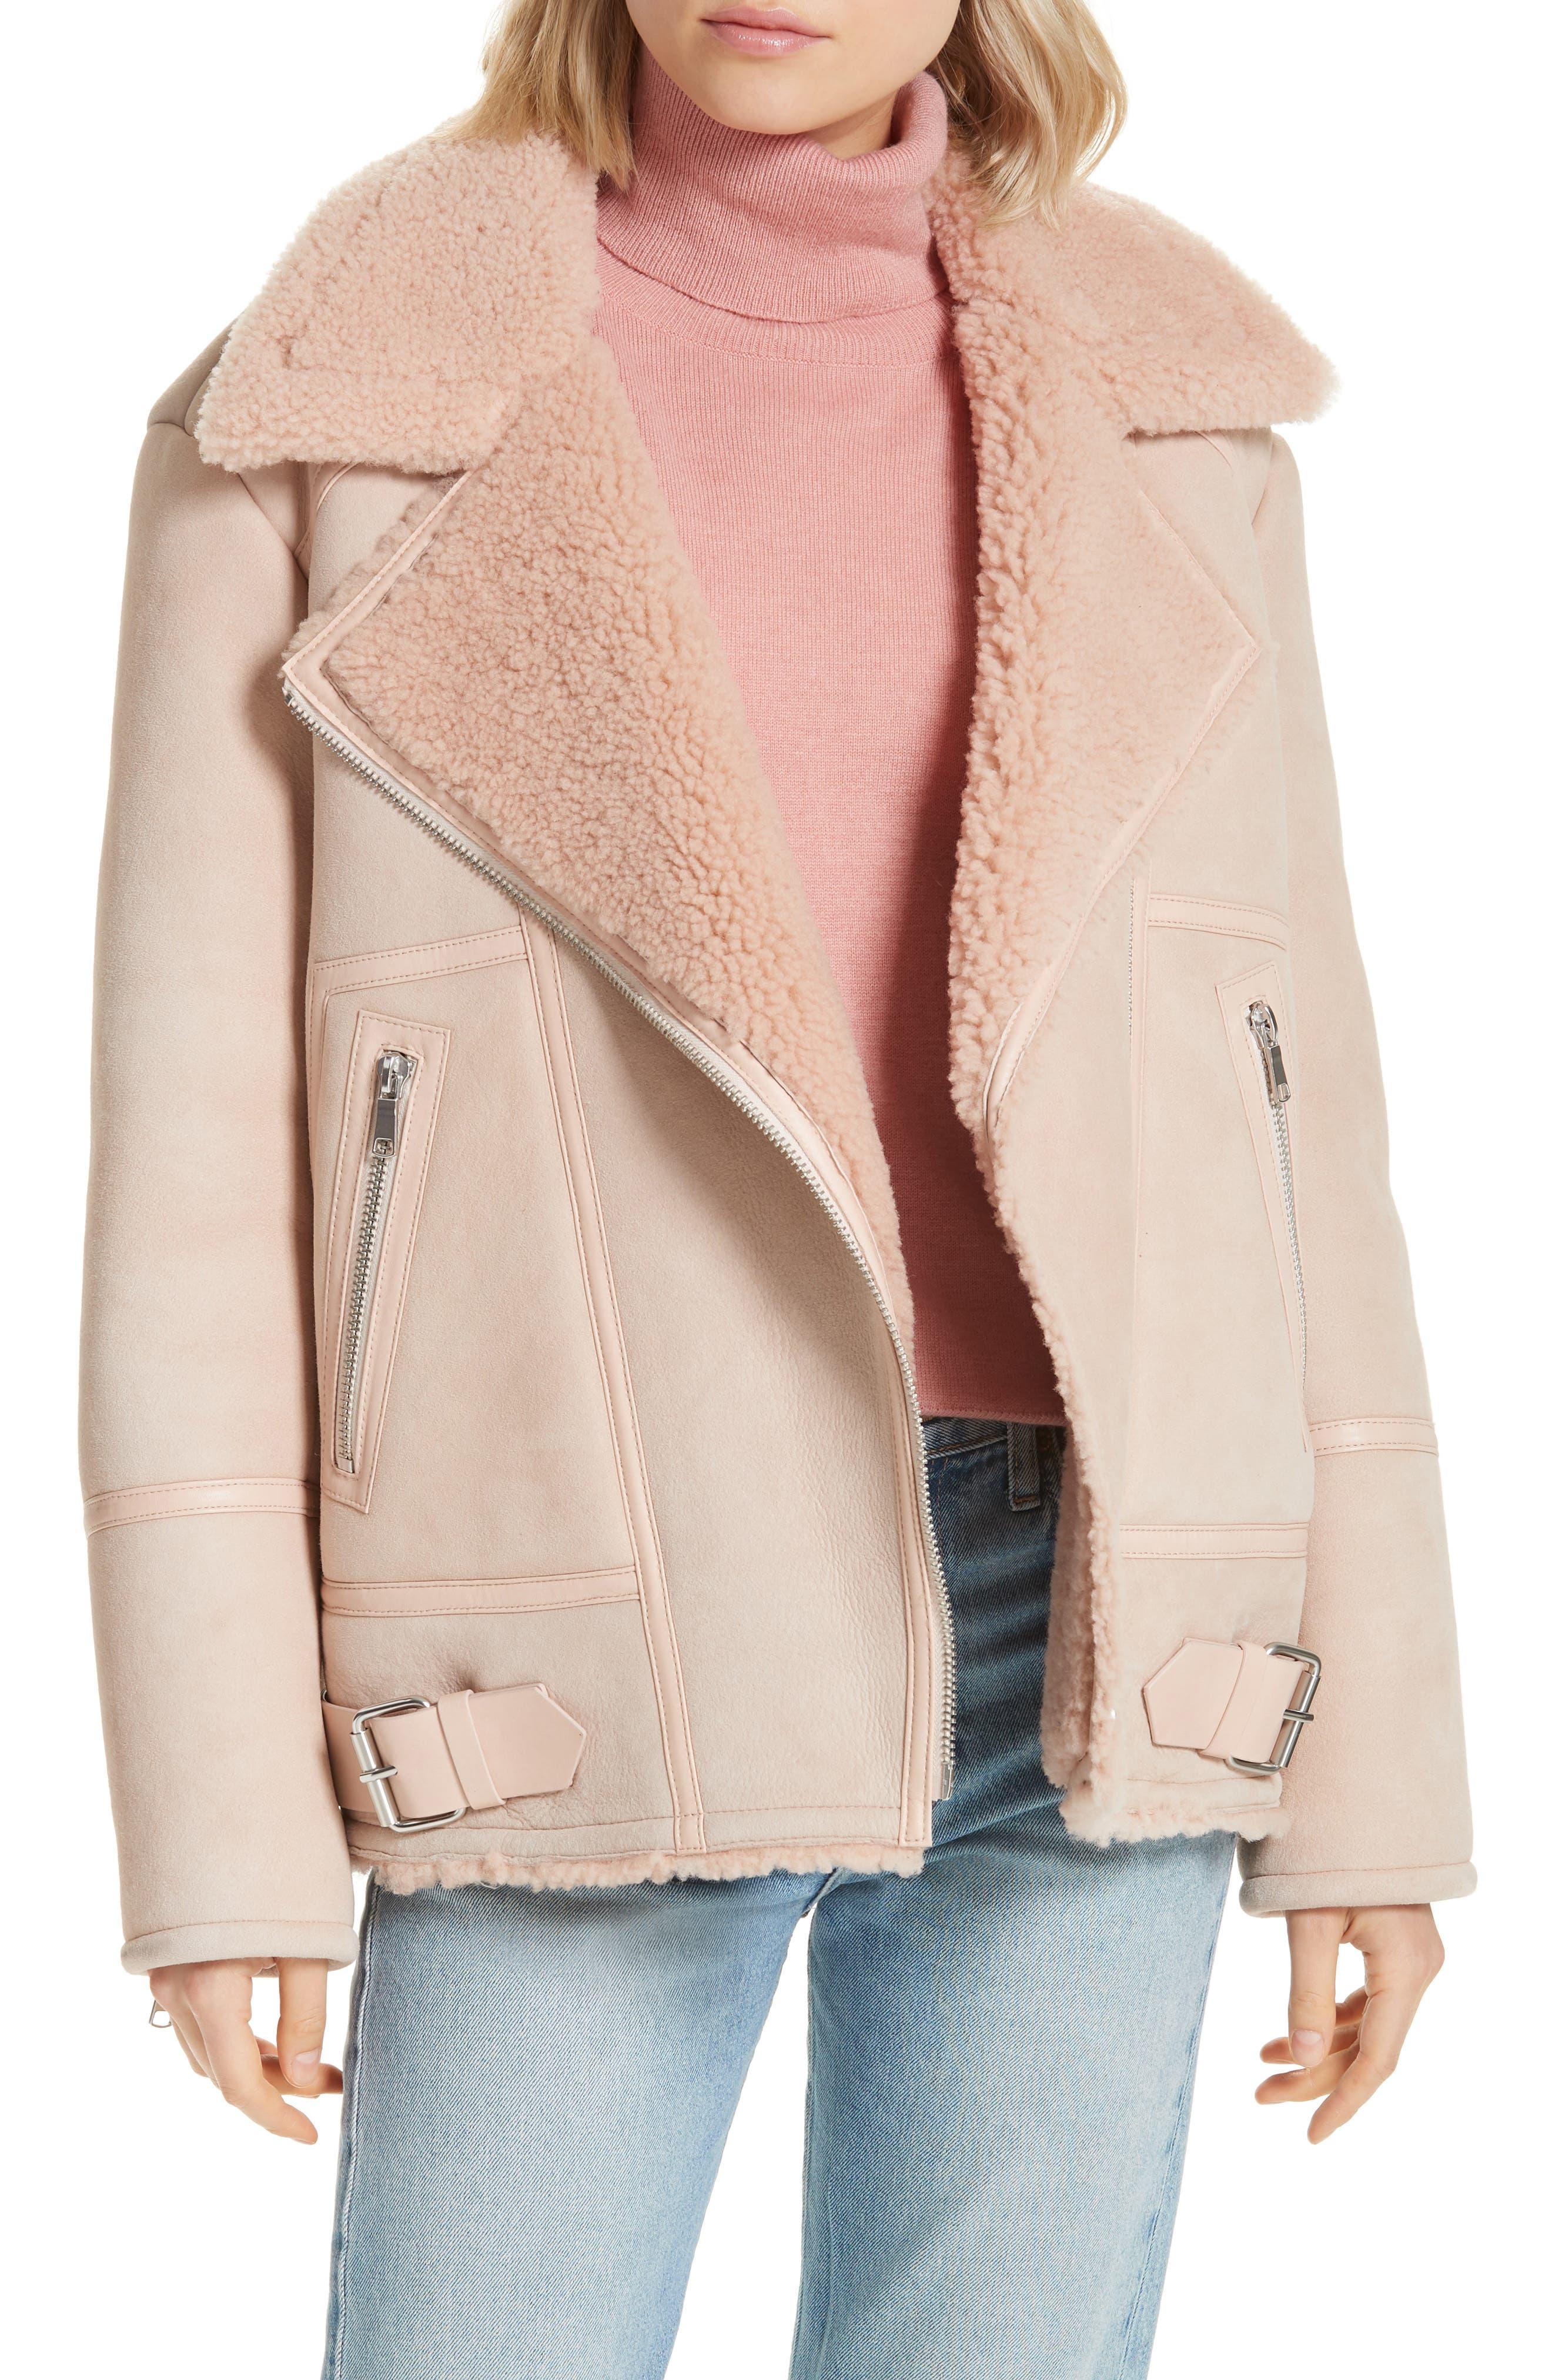 Joie Darnesha Genuine Shearling Jacket, Beige